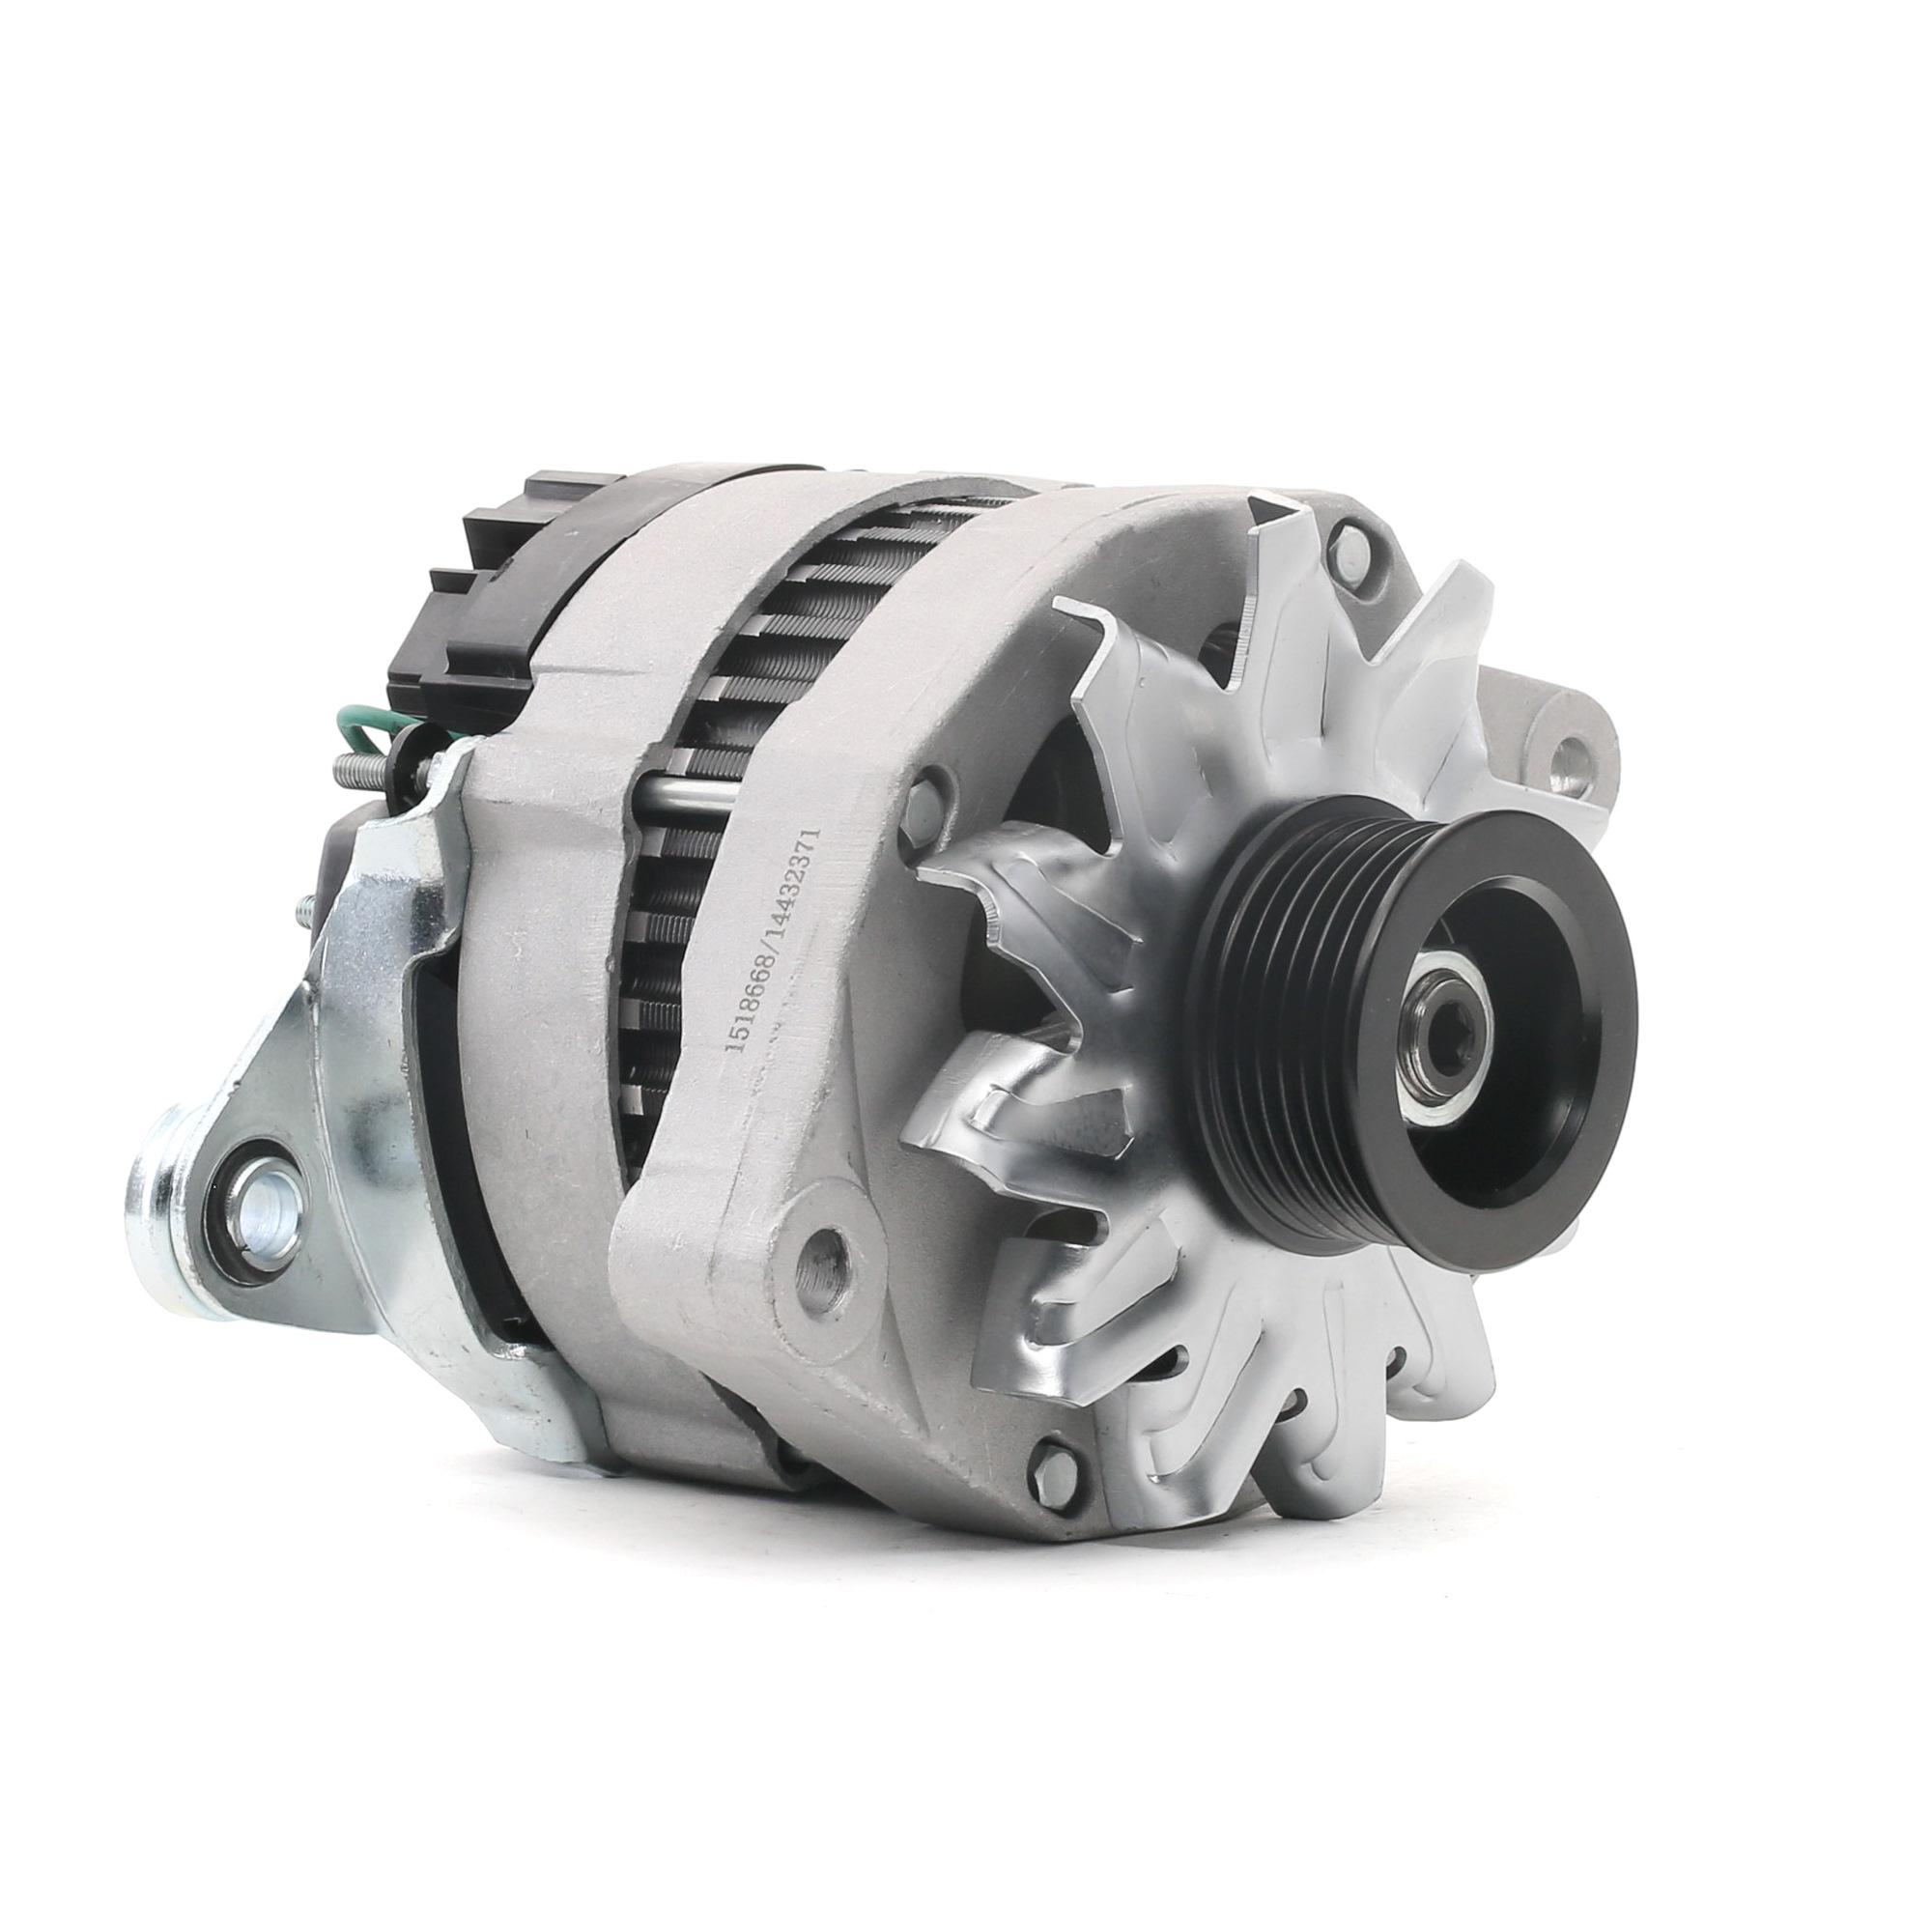 Koop RIDEX Dynamo / Alternator 4G0473 vrachtwagen